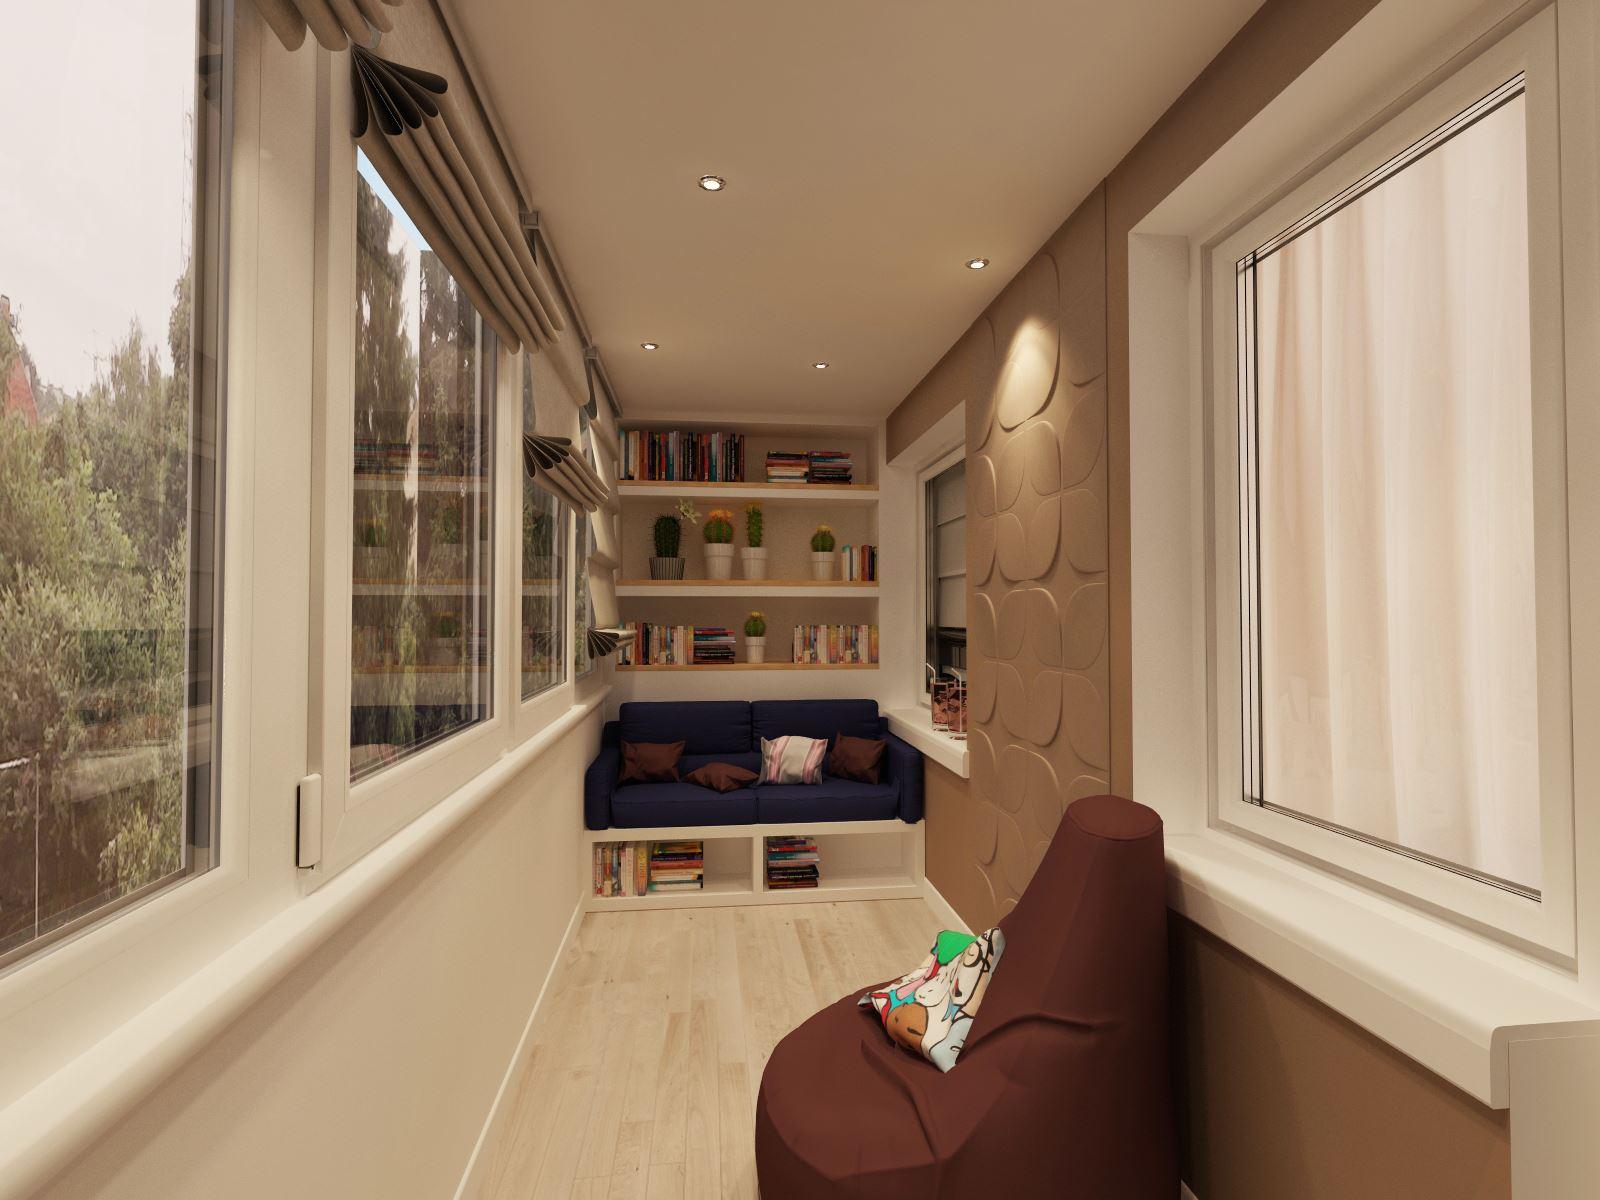 Интерьер балкона фото - фотогалерея.